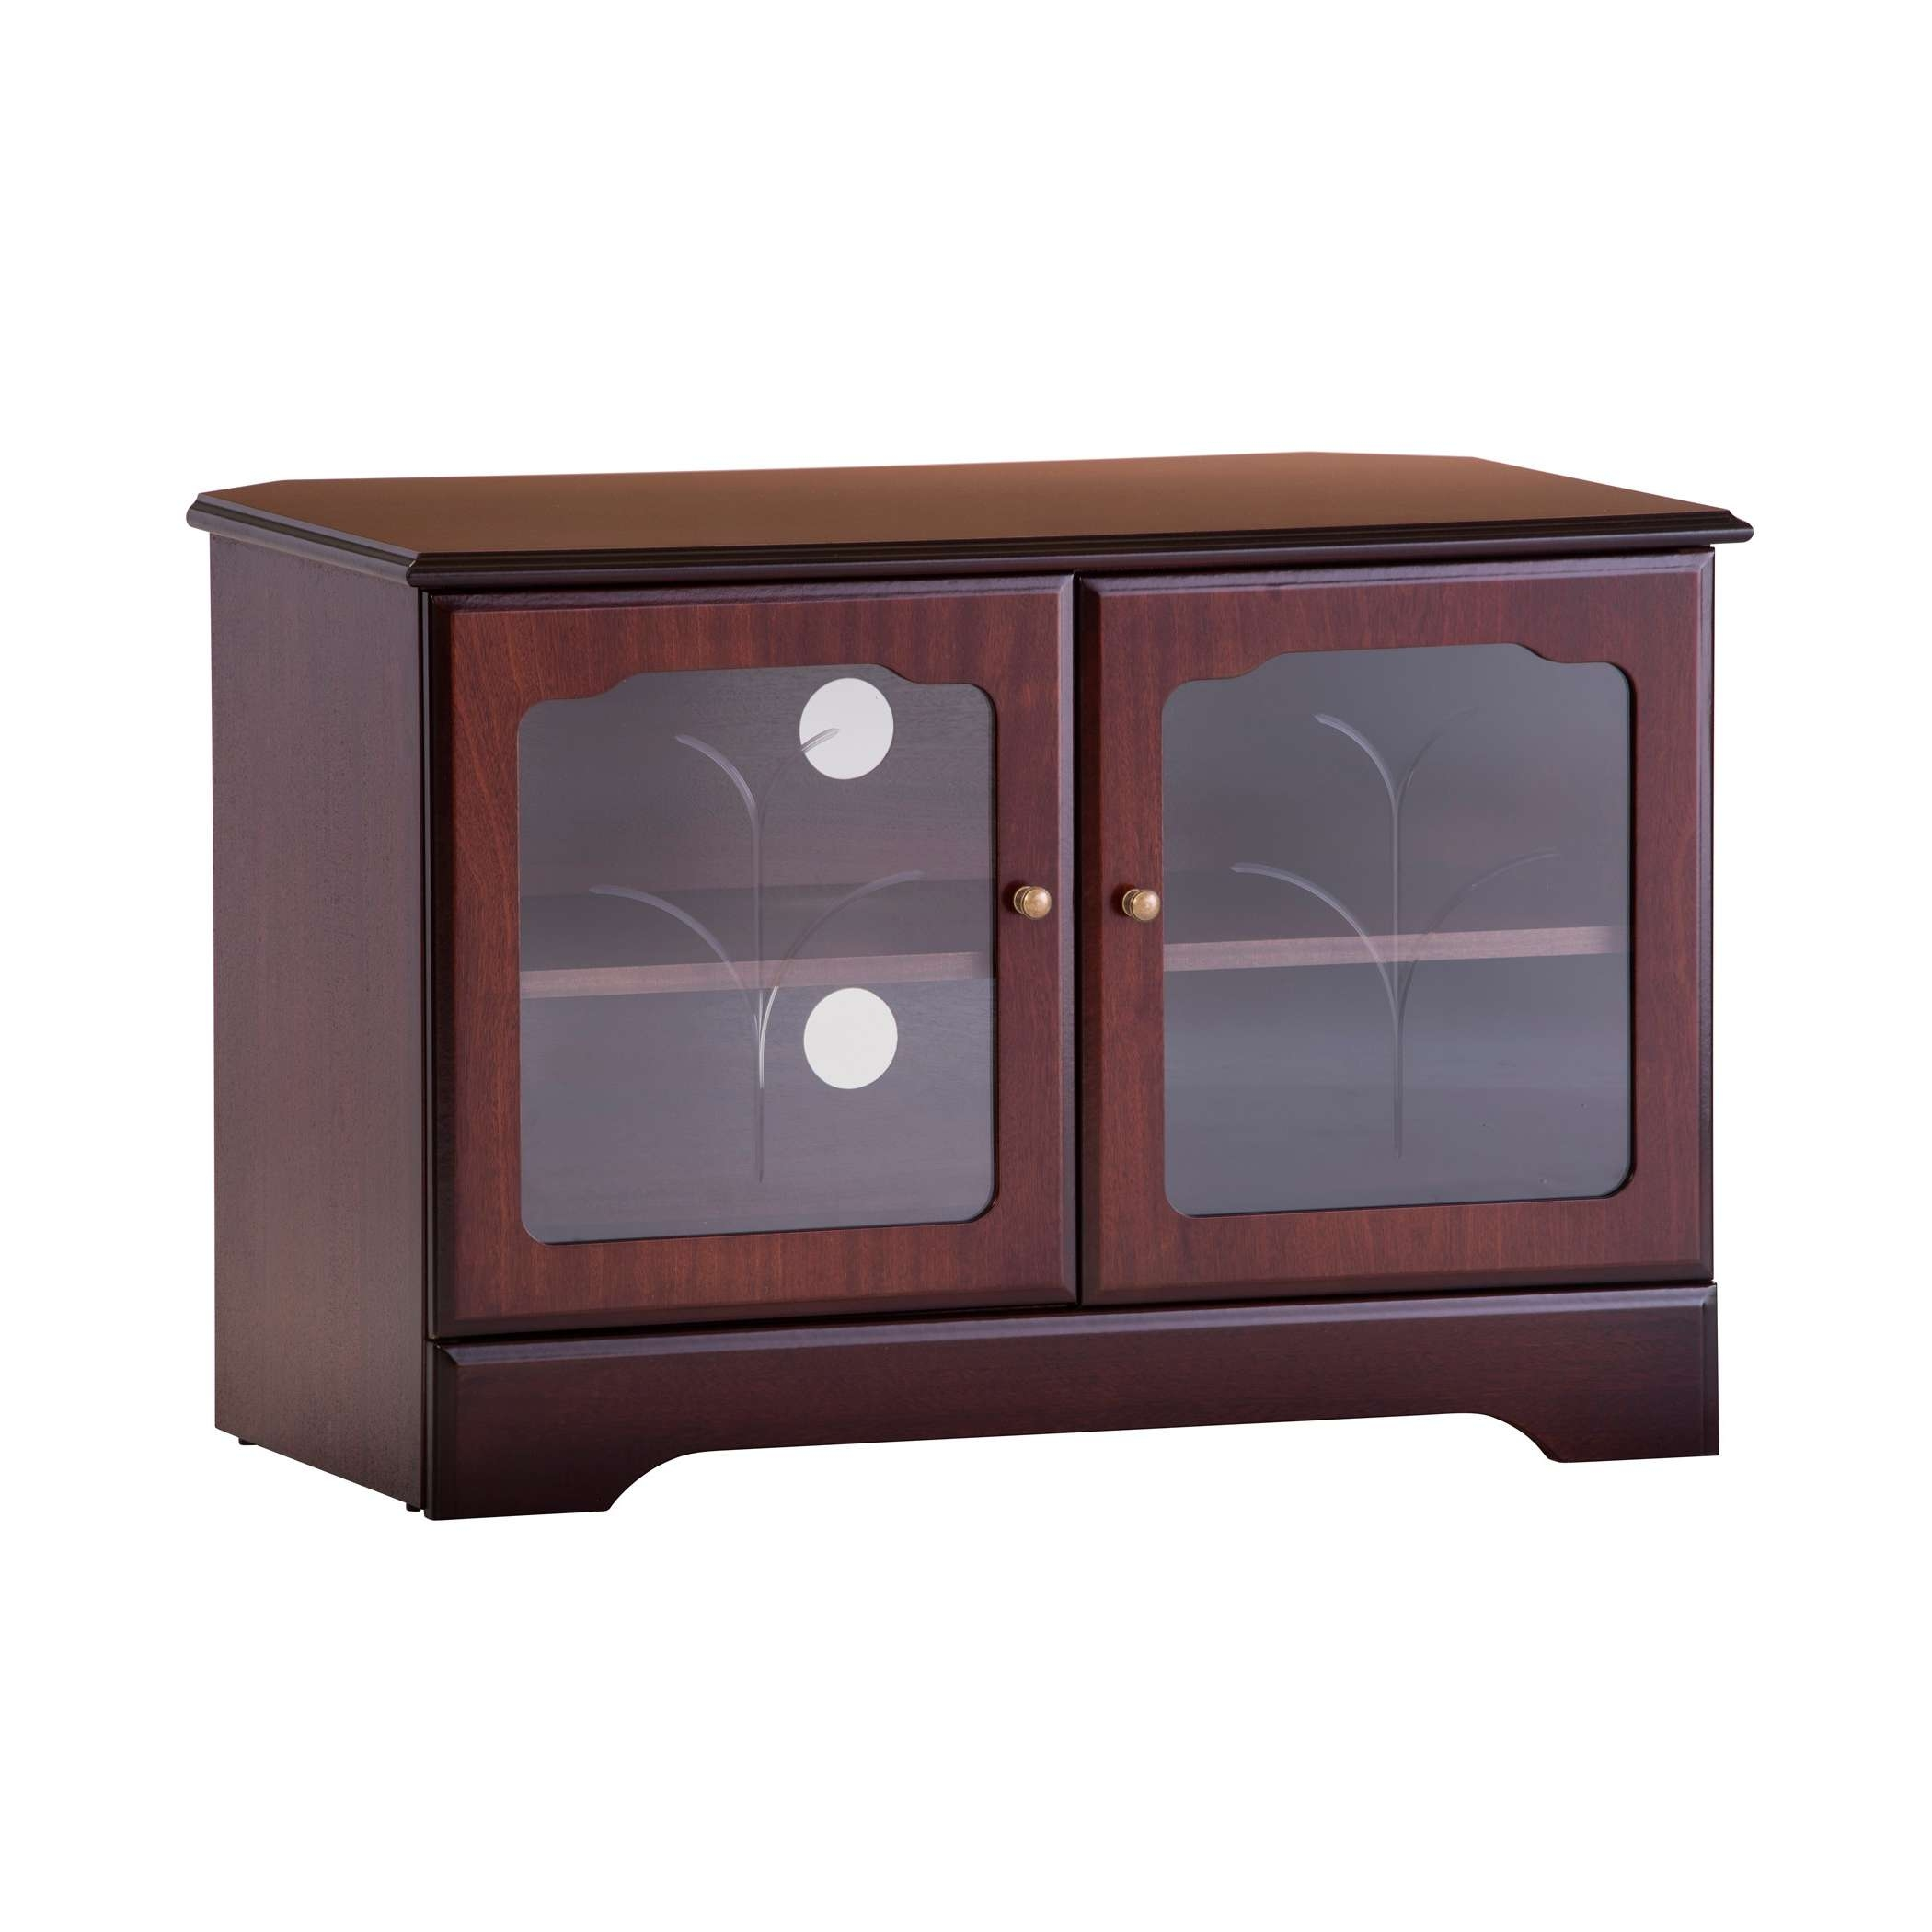 Corner Tv Stand In Mahogany Or Teak | Gola Furniture Uk For Mahogany Tv Stands (View 6 of 15)